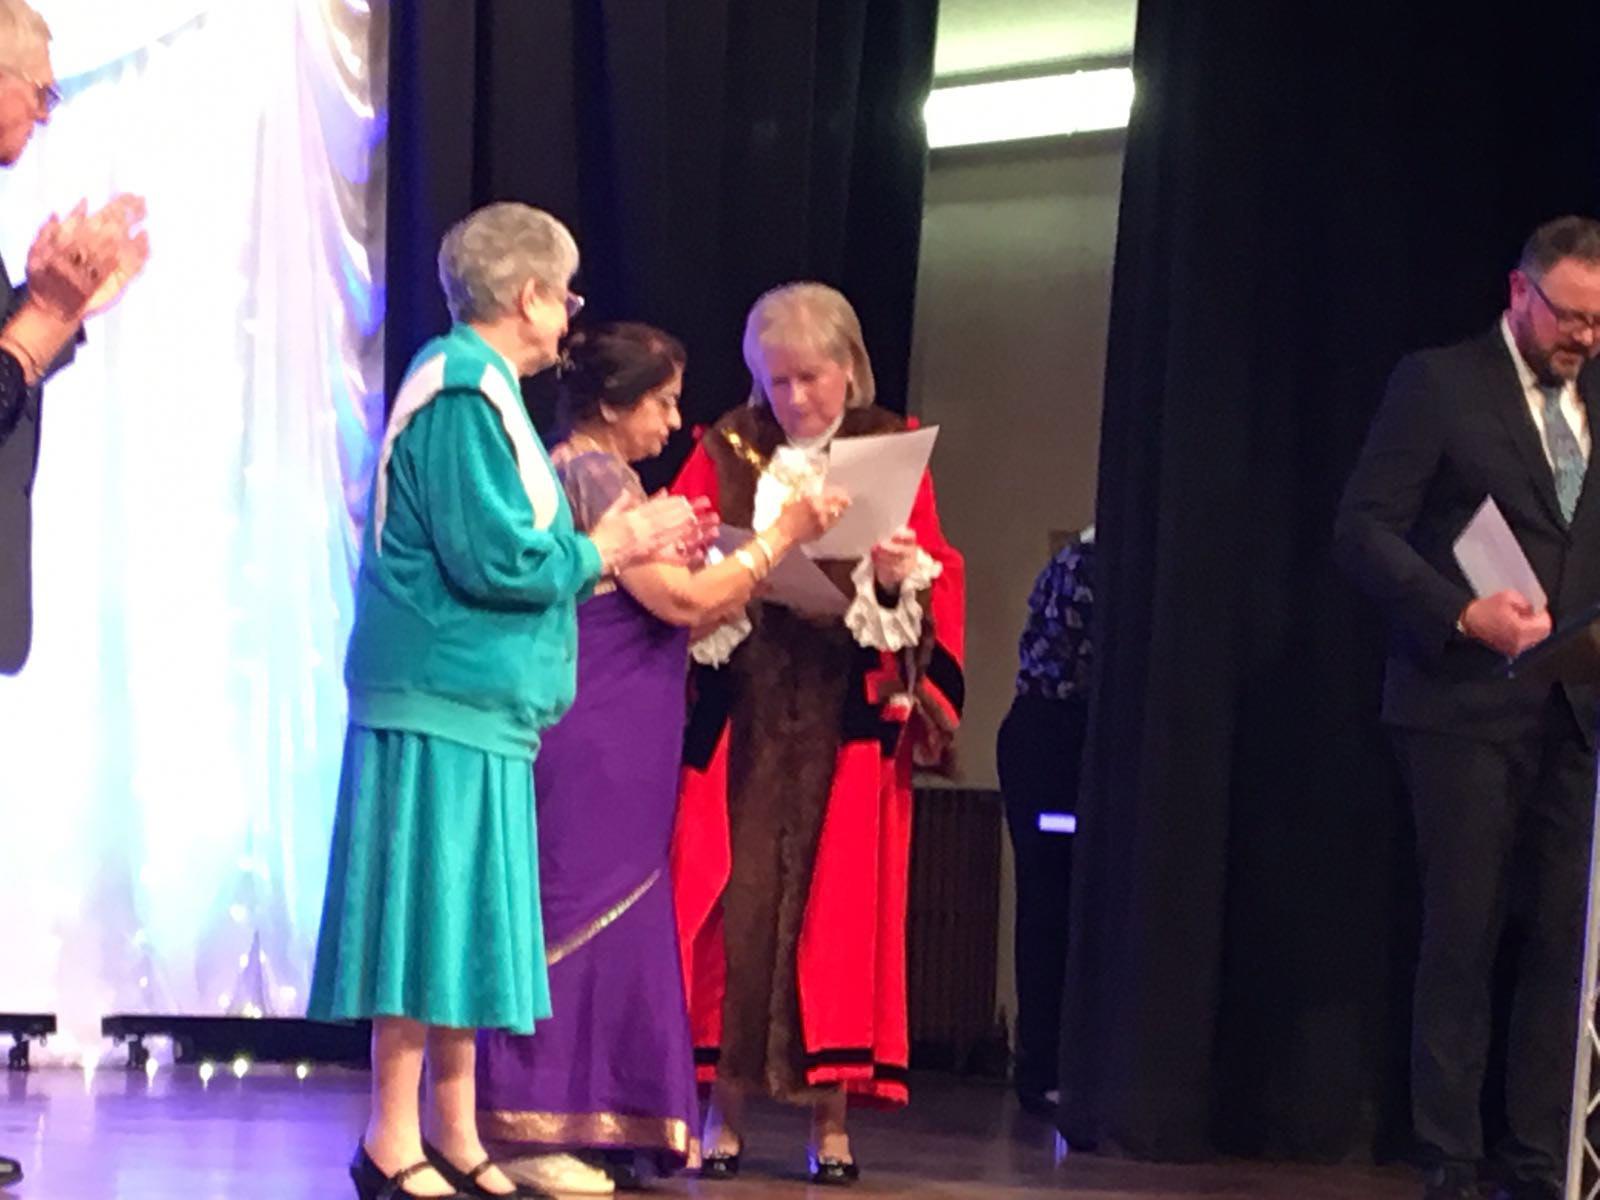 Mayor community Award on 22 March 2018 in Town Hall Redbridge